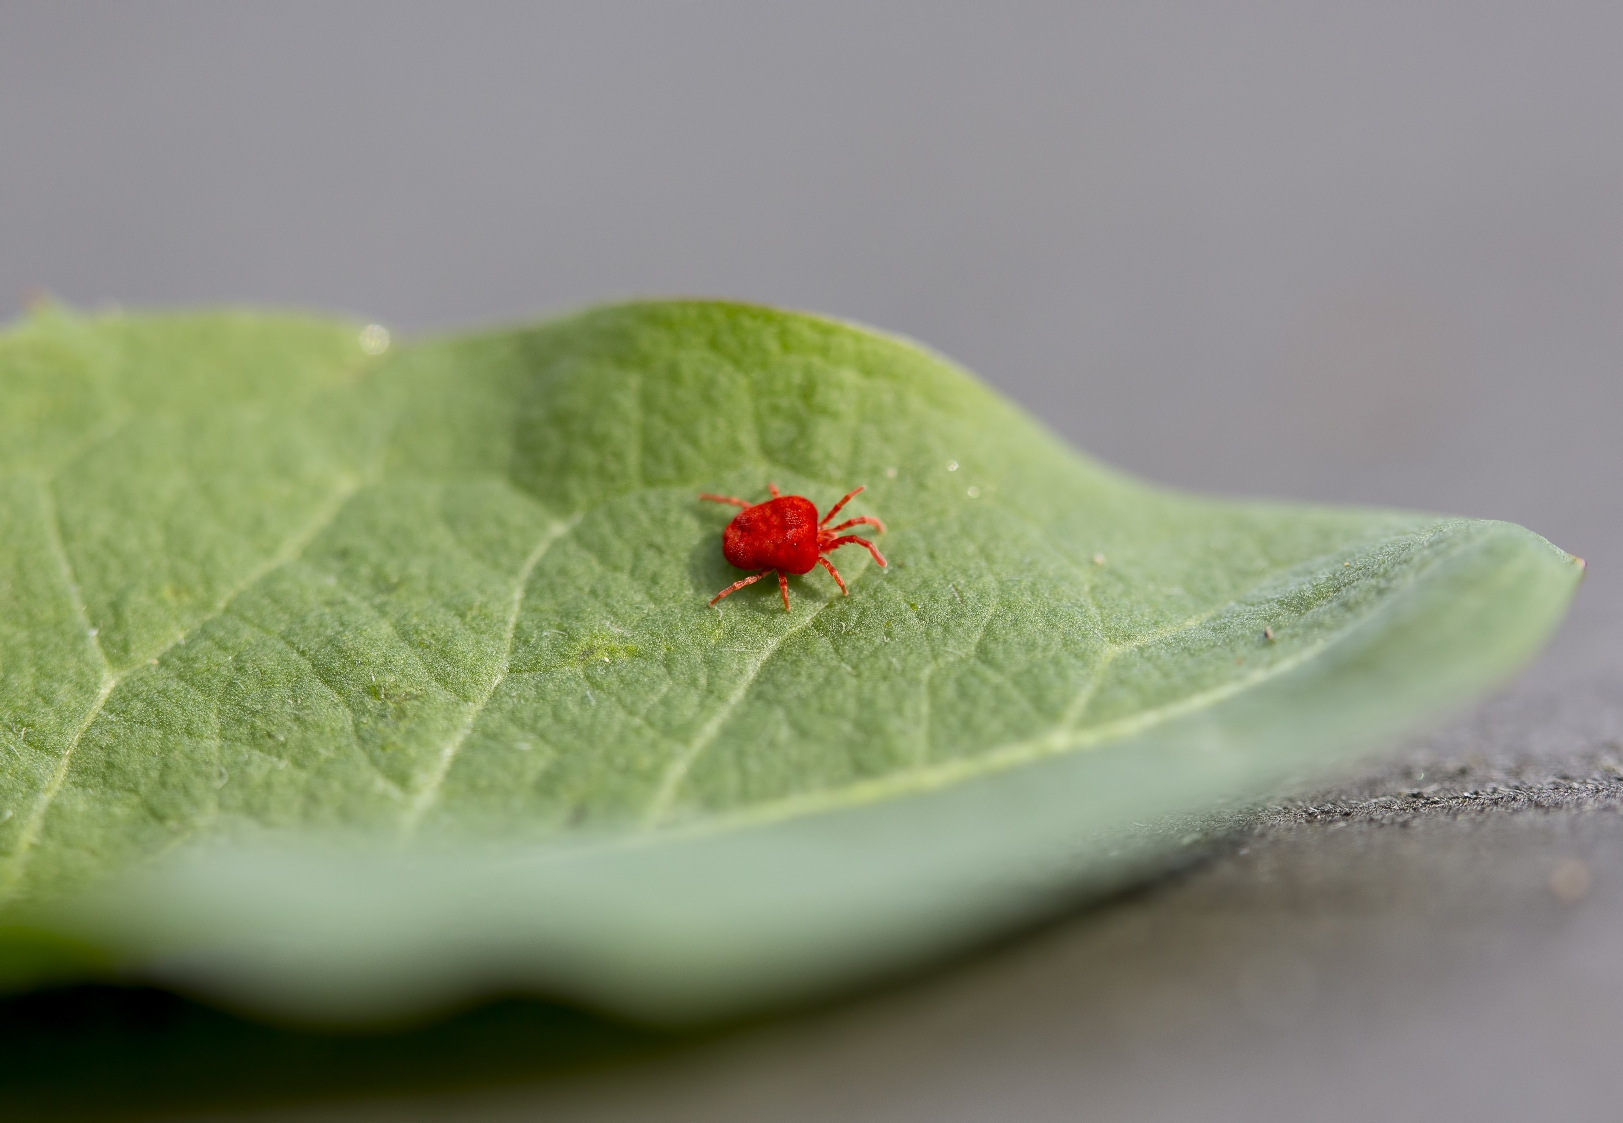 shutterstock_spider_for_biobee.jpg